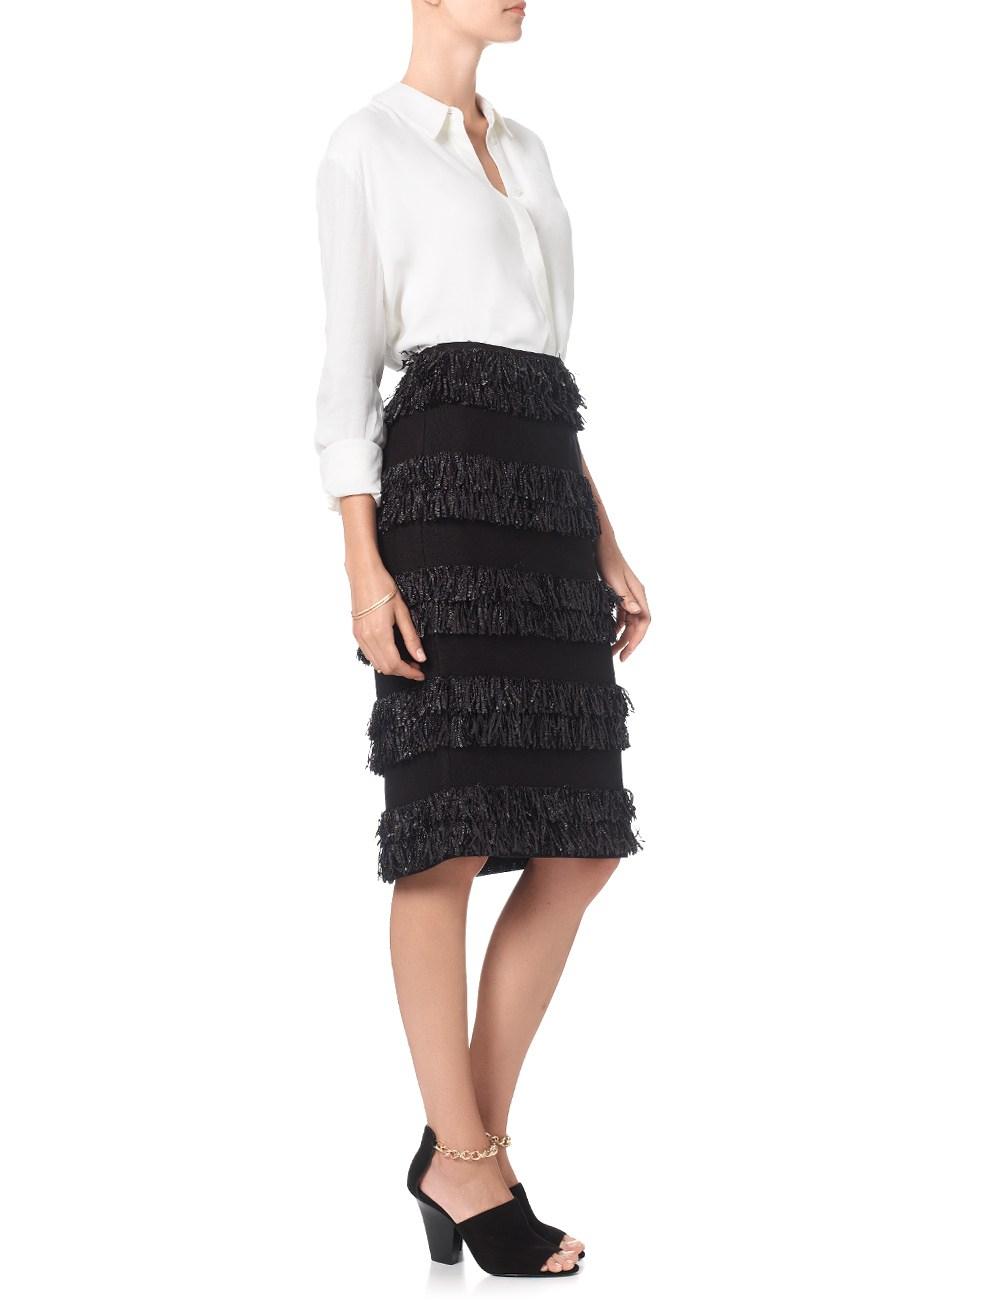 samuji black fringed pencil skirt in black lyst